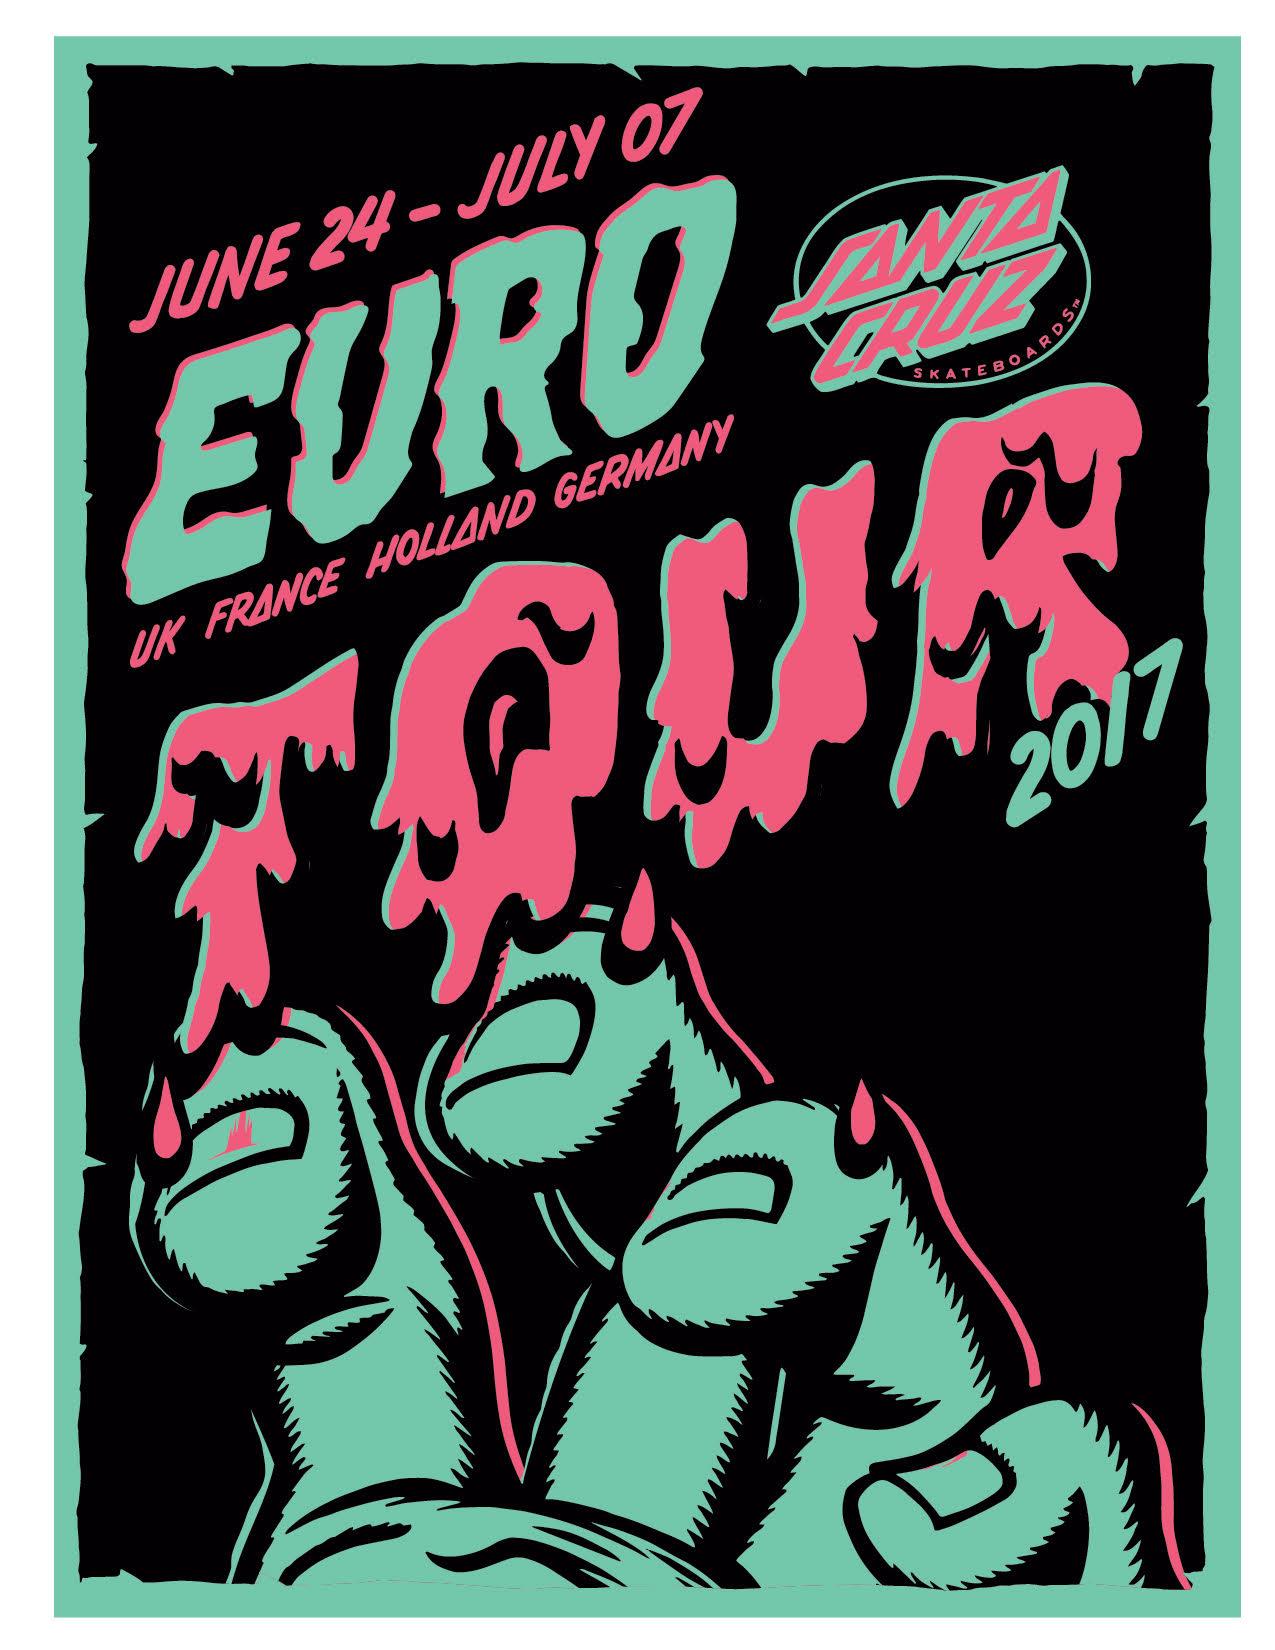 Euro Tours Summer 2017